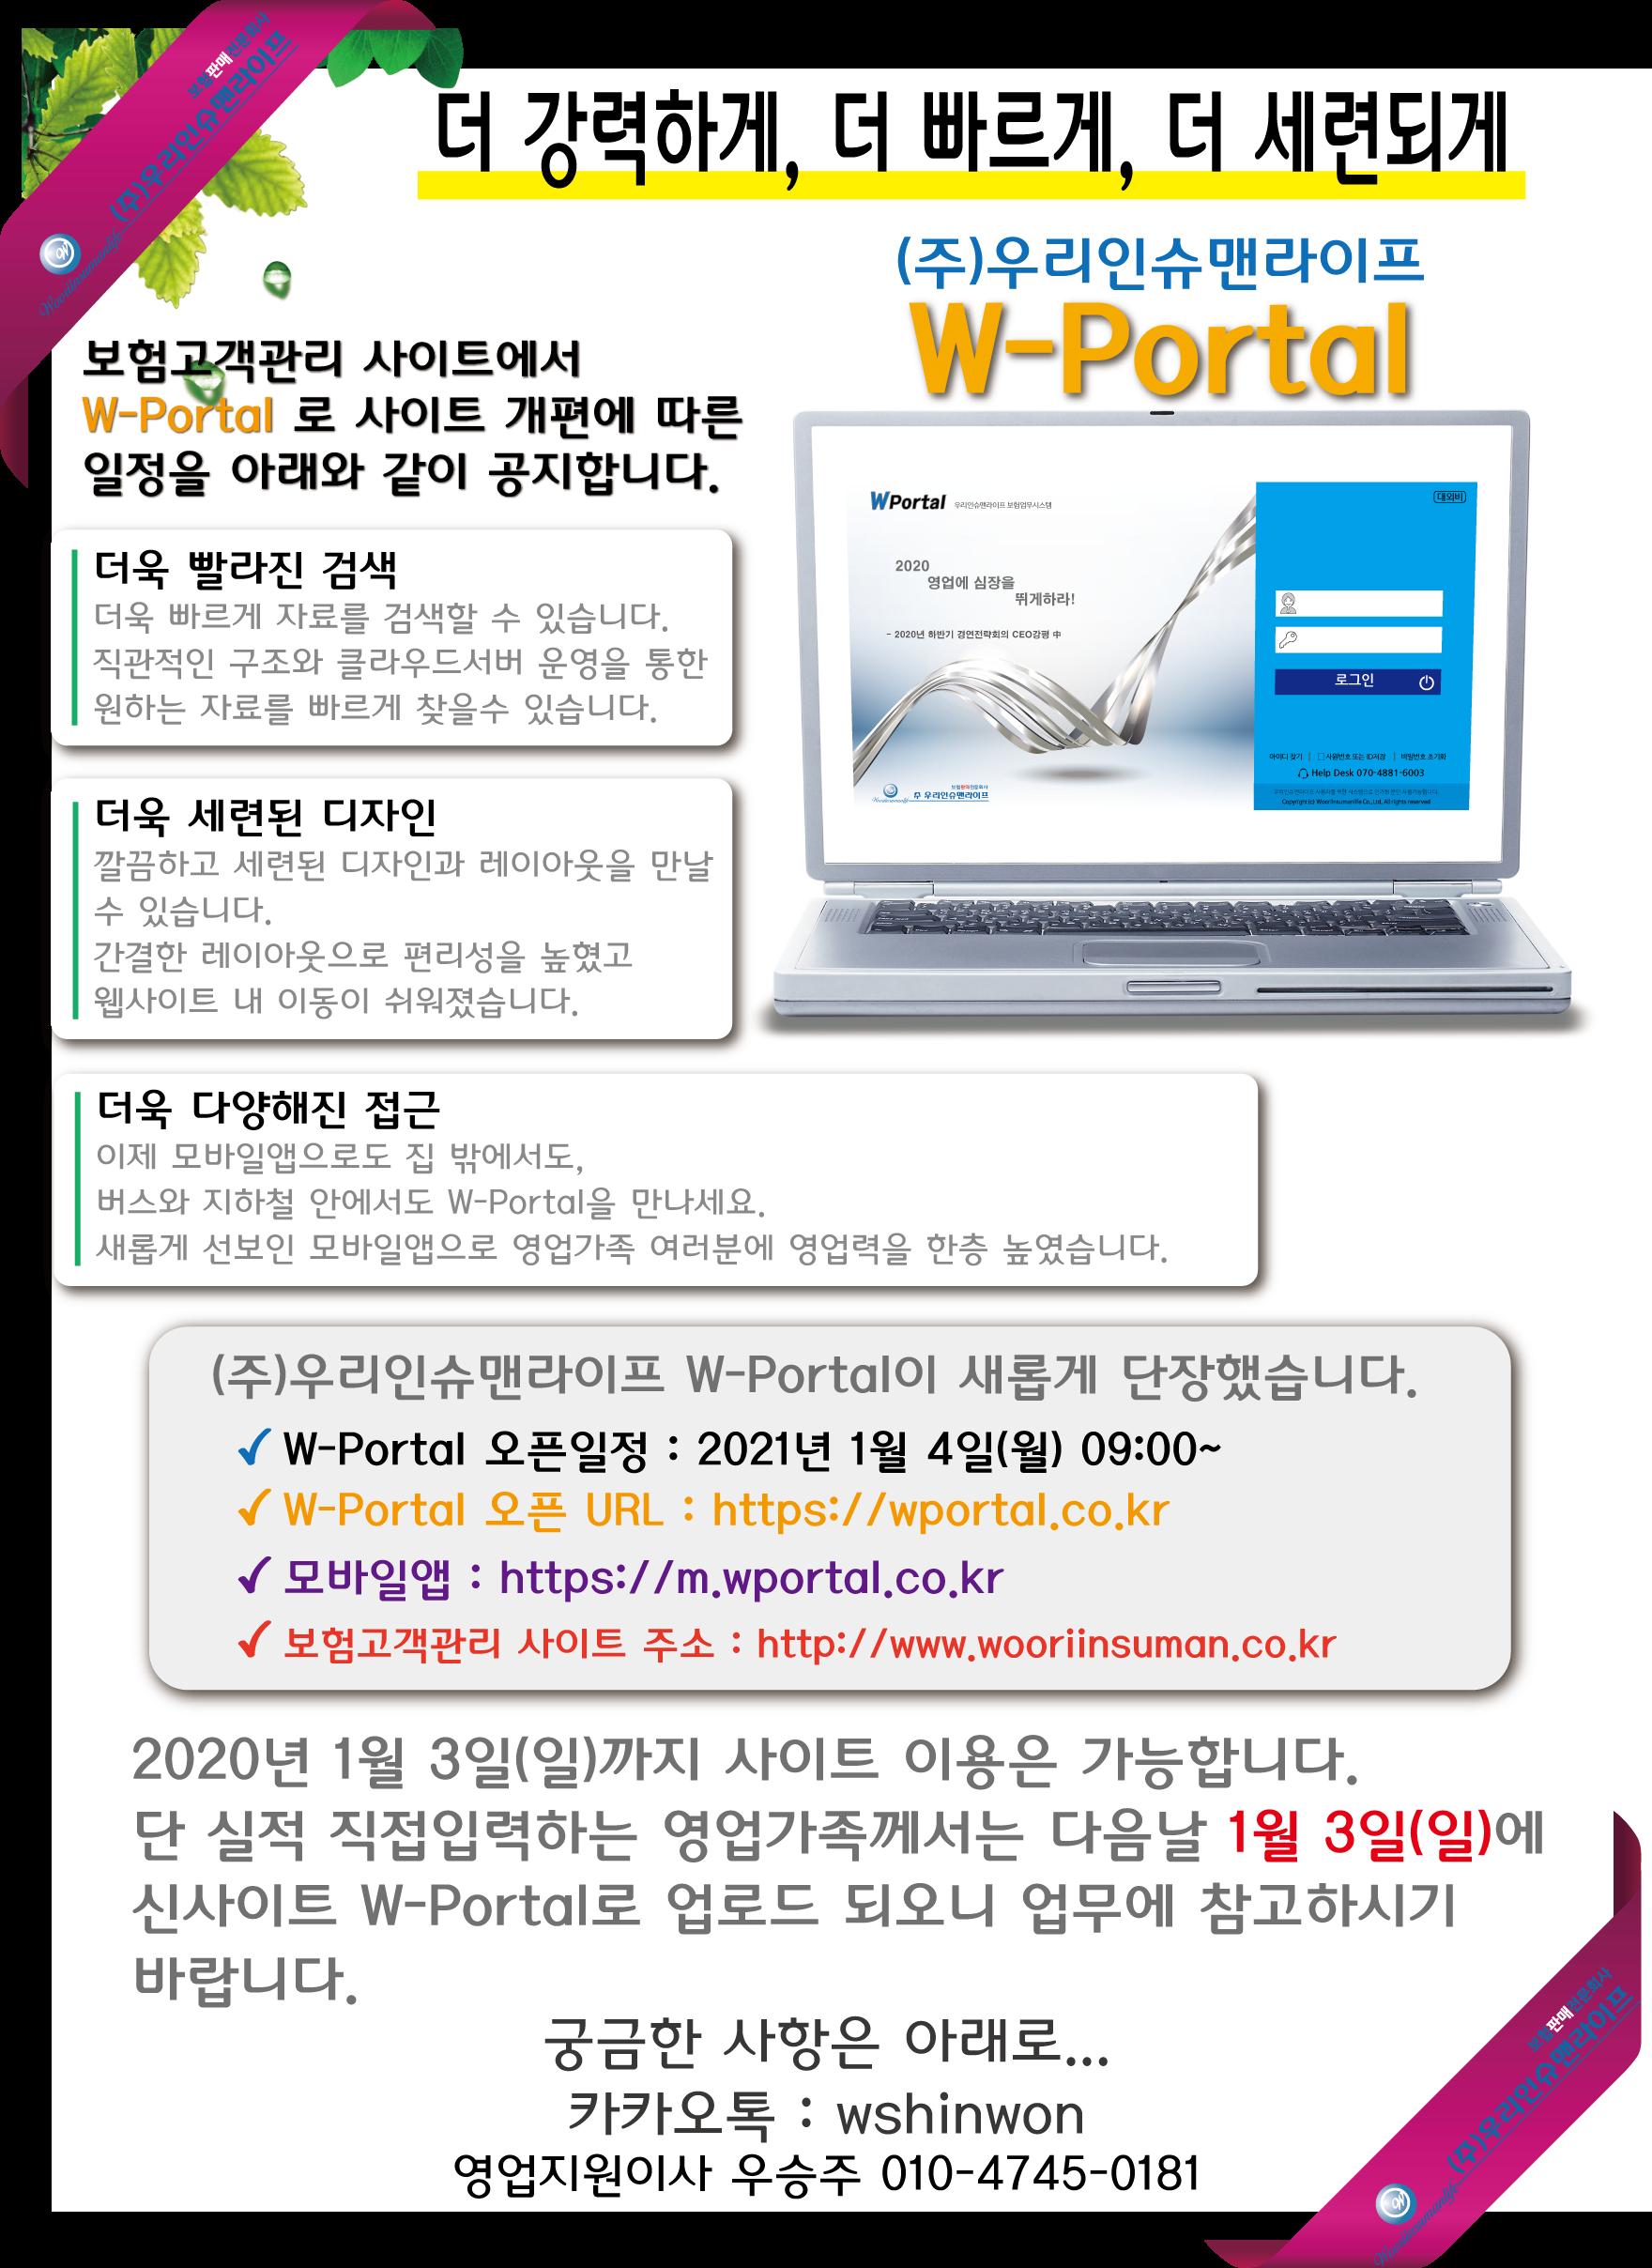 WPortal_오픈공지.png